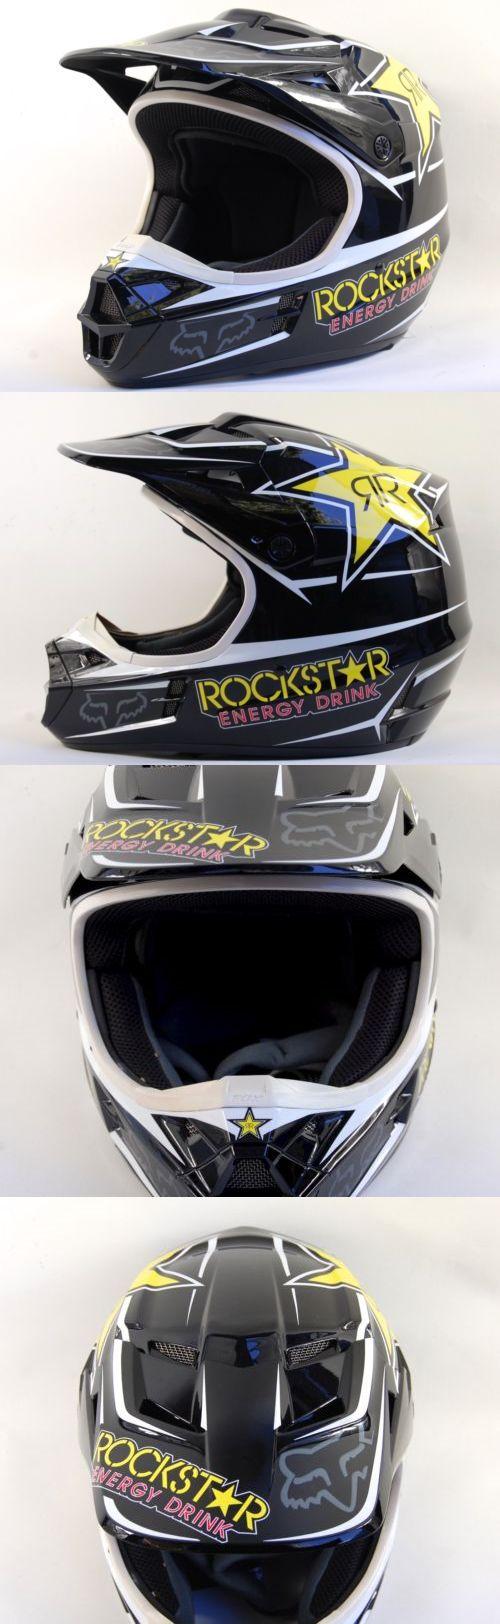 Helmet Accessories 177865: Fox Racing Dot Bmx Rockstars Mens Motocross Snell Helmet Size Medium 7 1 8-7 1 4 -> BUY IT NOW ONLY: $130.49 on eBay!